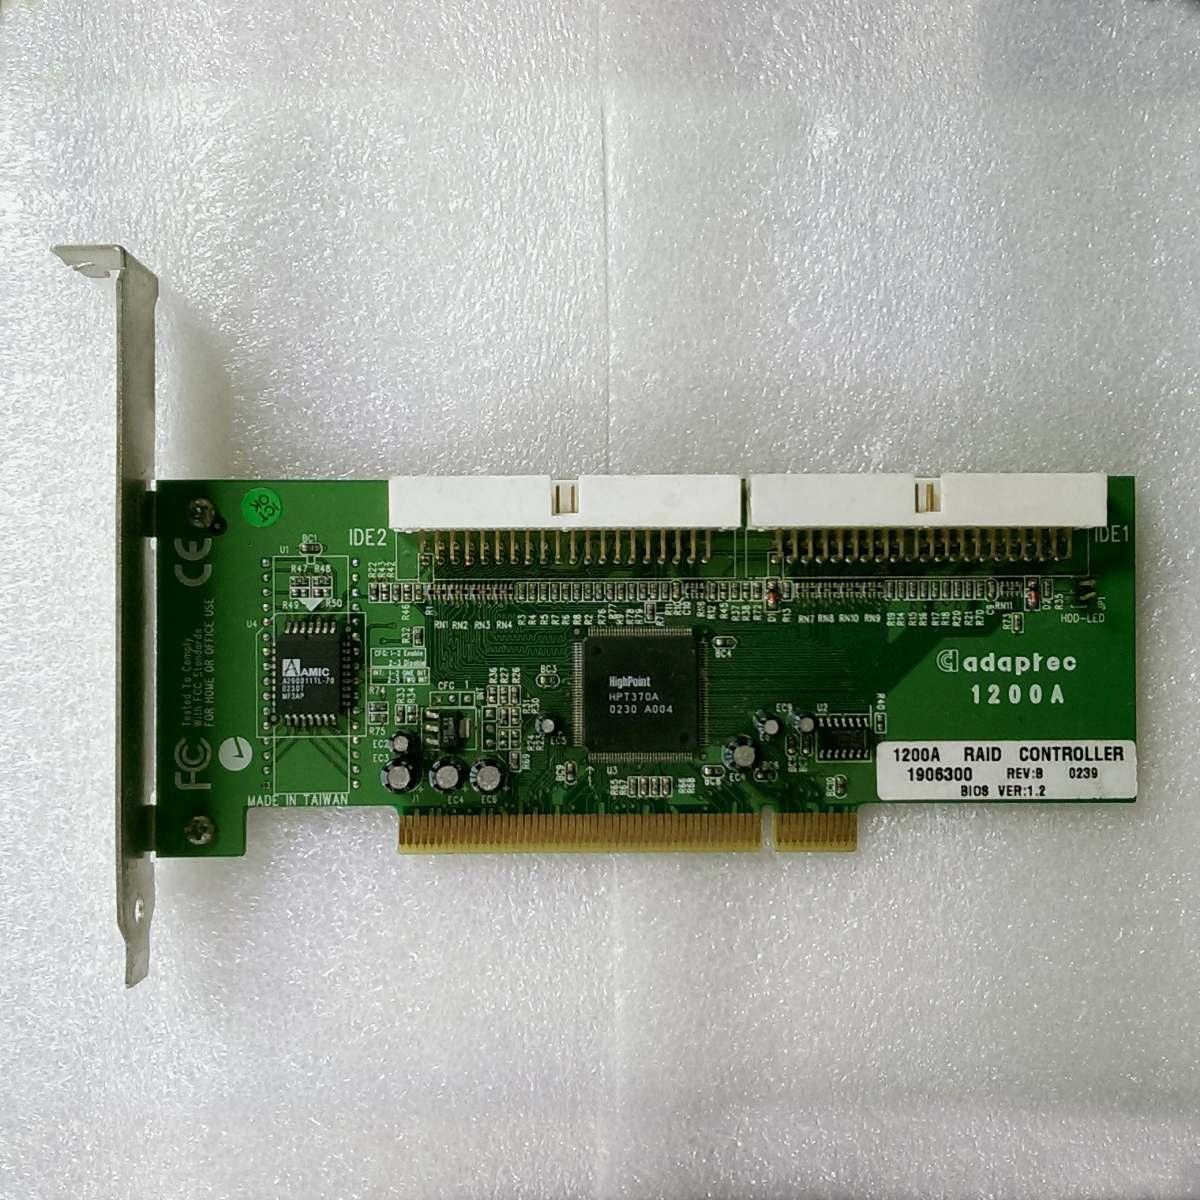 ADAPTEC 1200A RAID CONTROLLER WINDOWS XP DRIVER